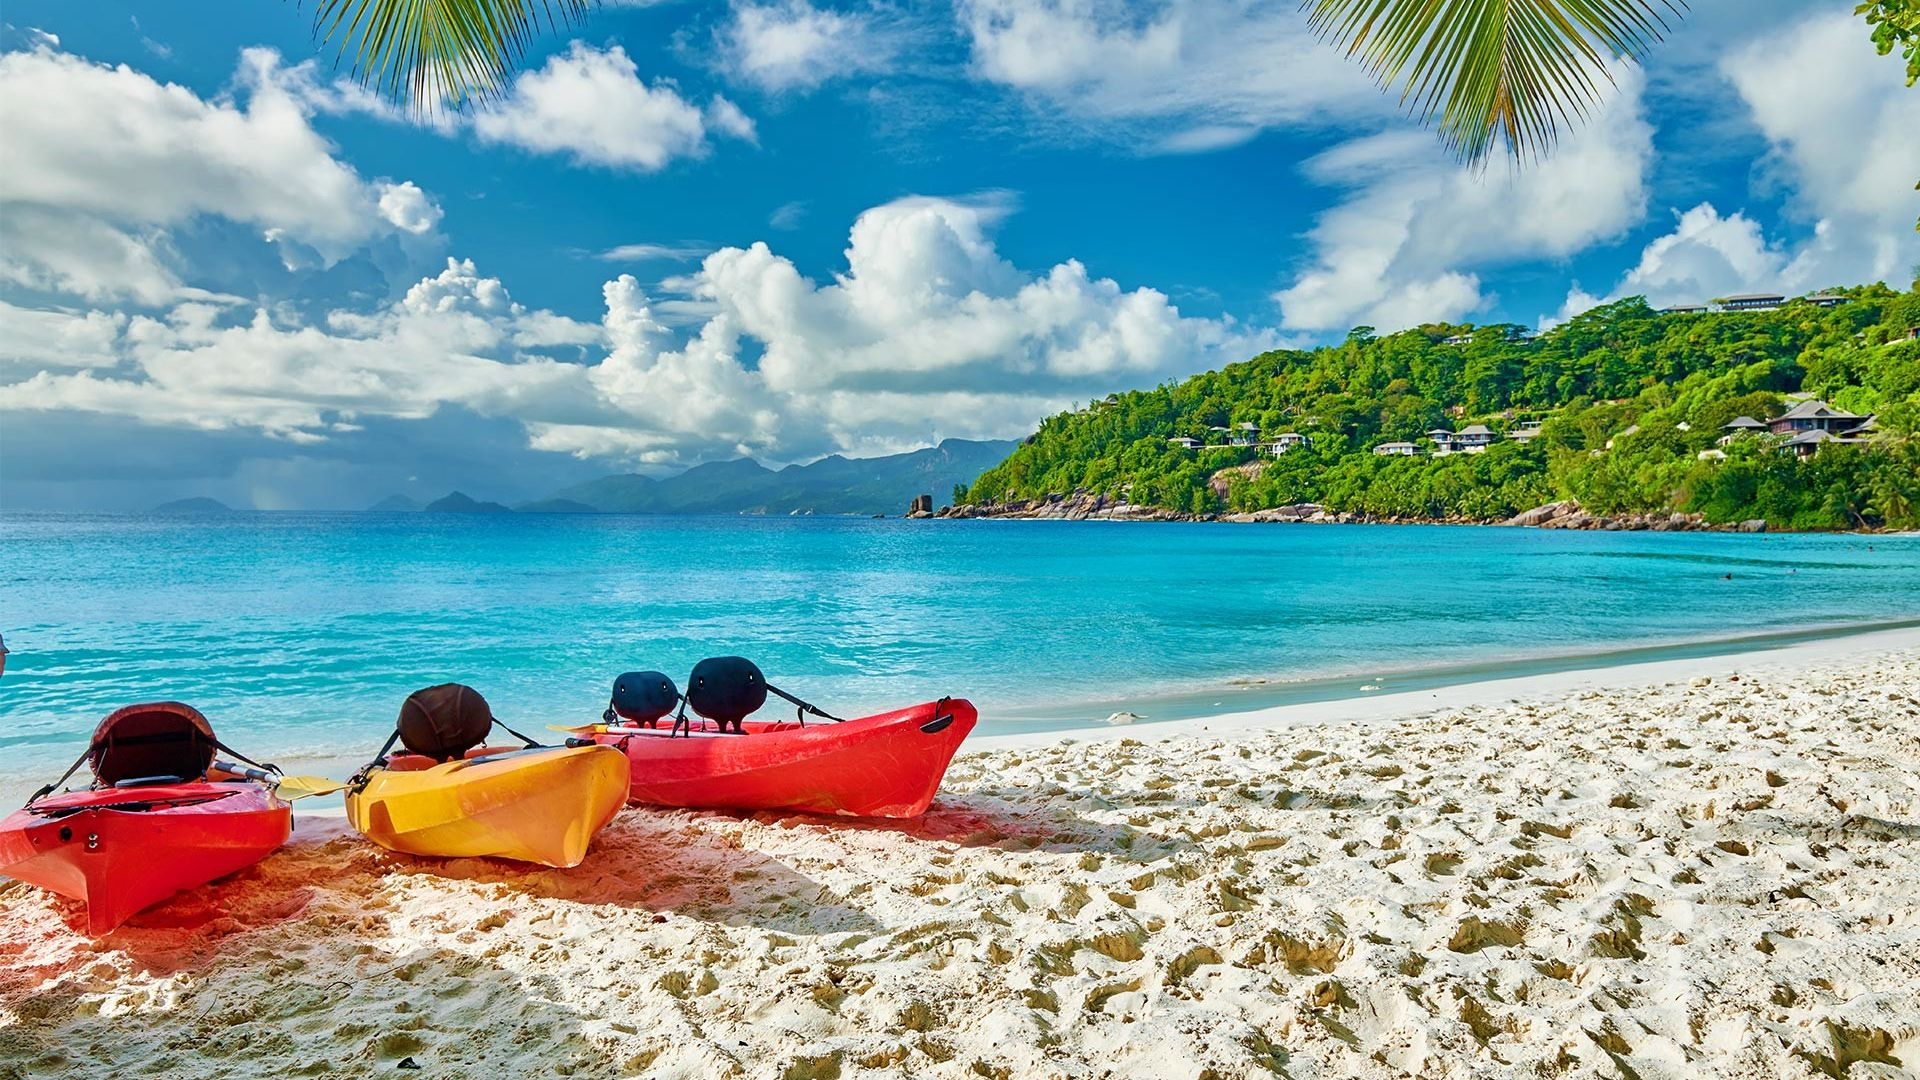 Craciun 2021 - Sejur plaja Insula Mahe, Seychelles, 10 zile